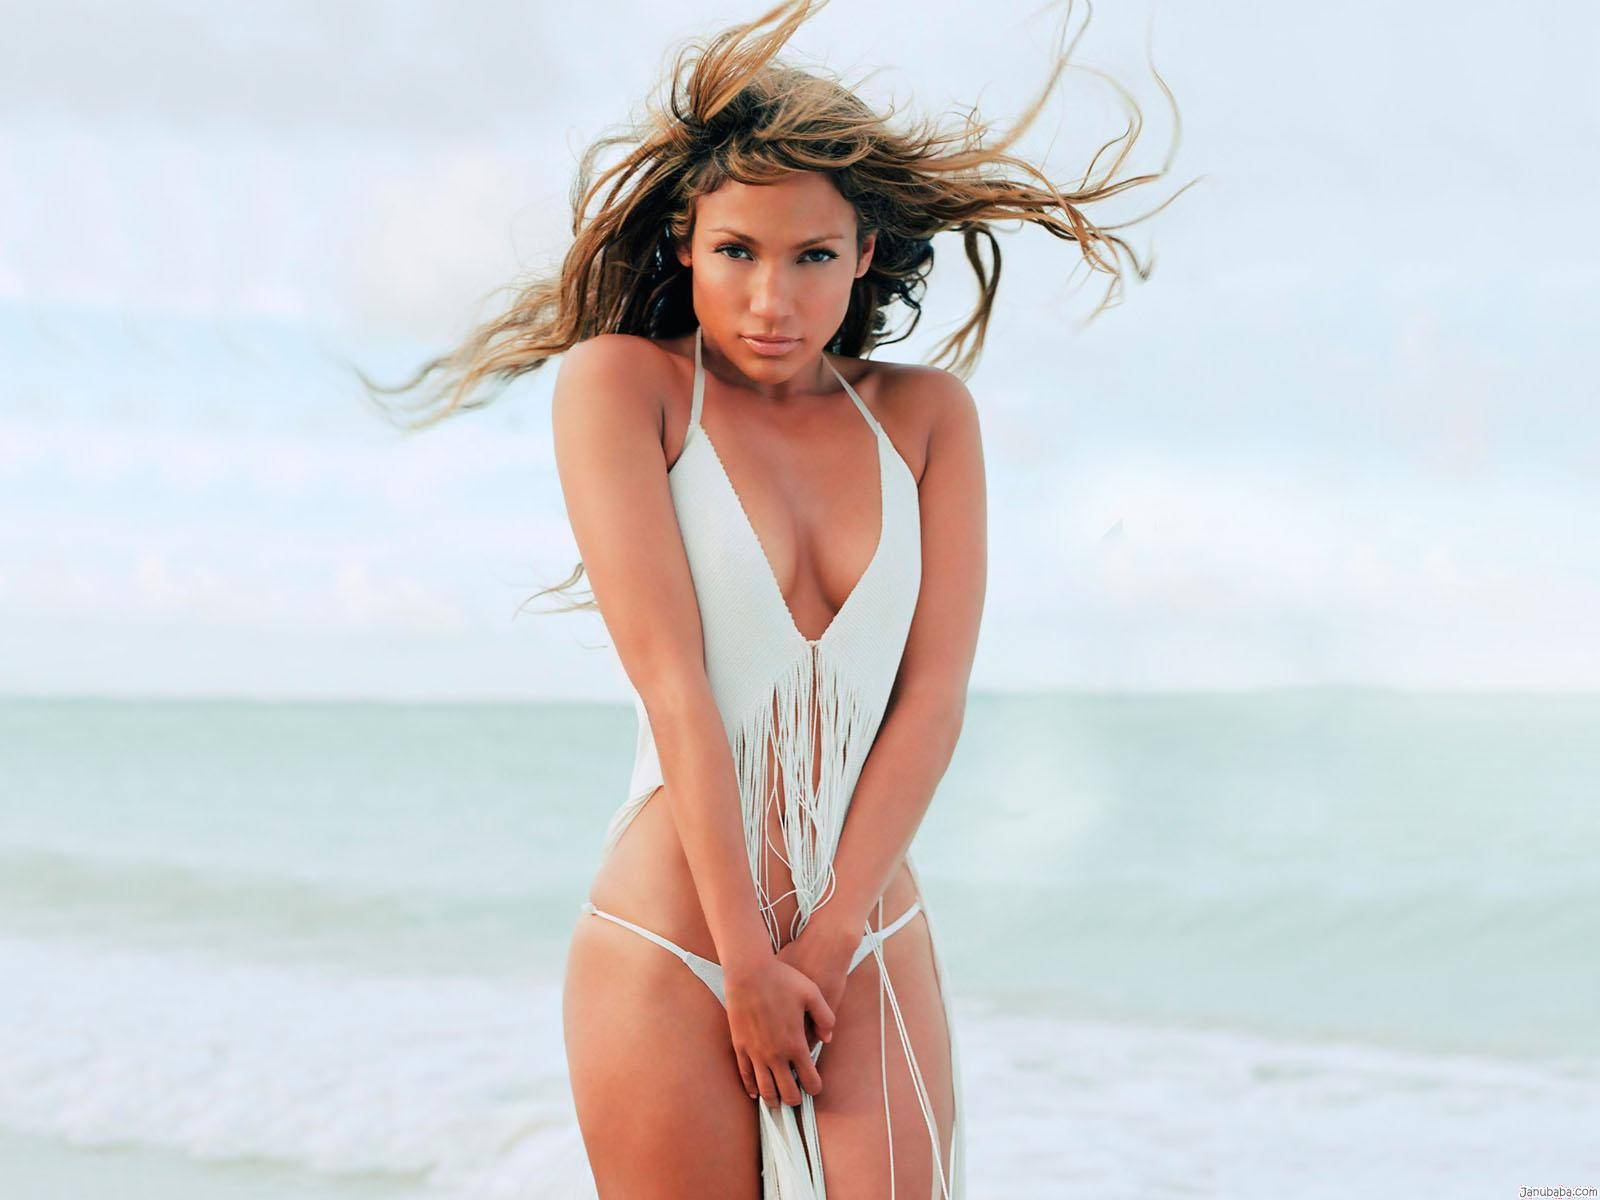 jennifer-lopez-bikini-wallpaper-image1.jpg